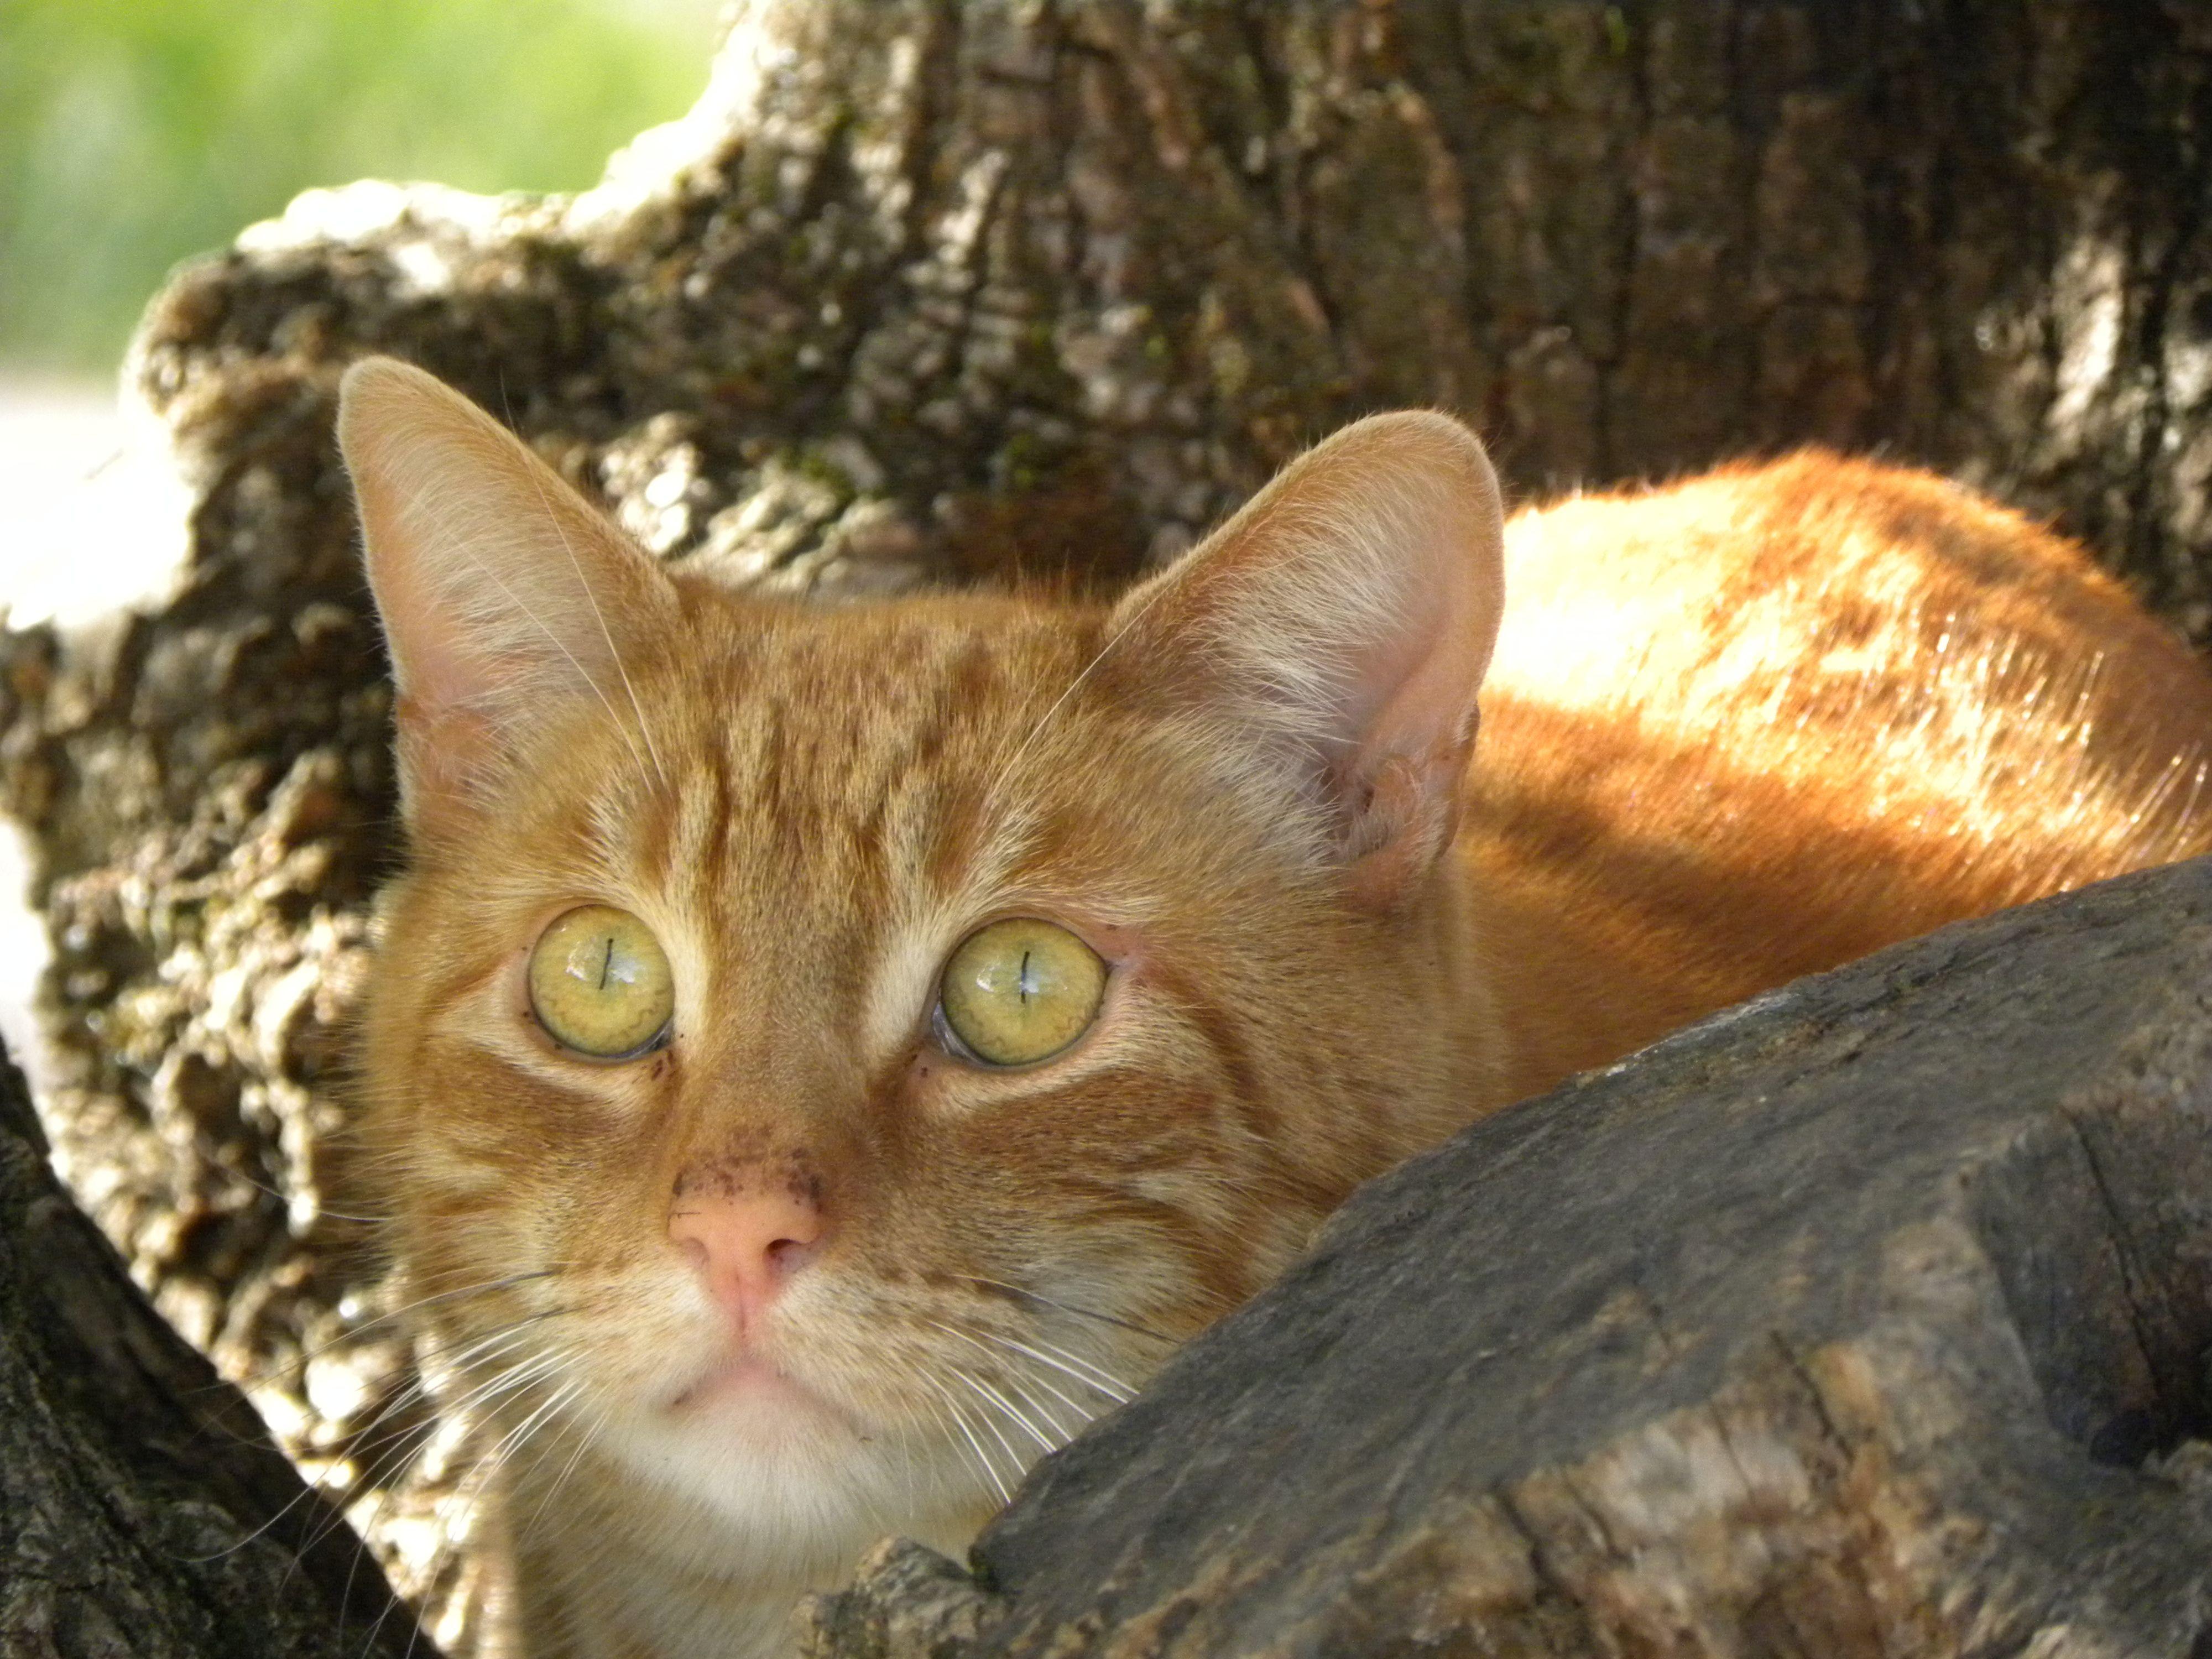 Lancelot - the winery cat from Castello di Amorosa in Napa ...